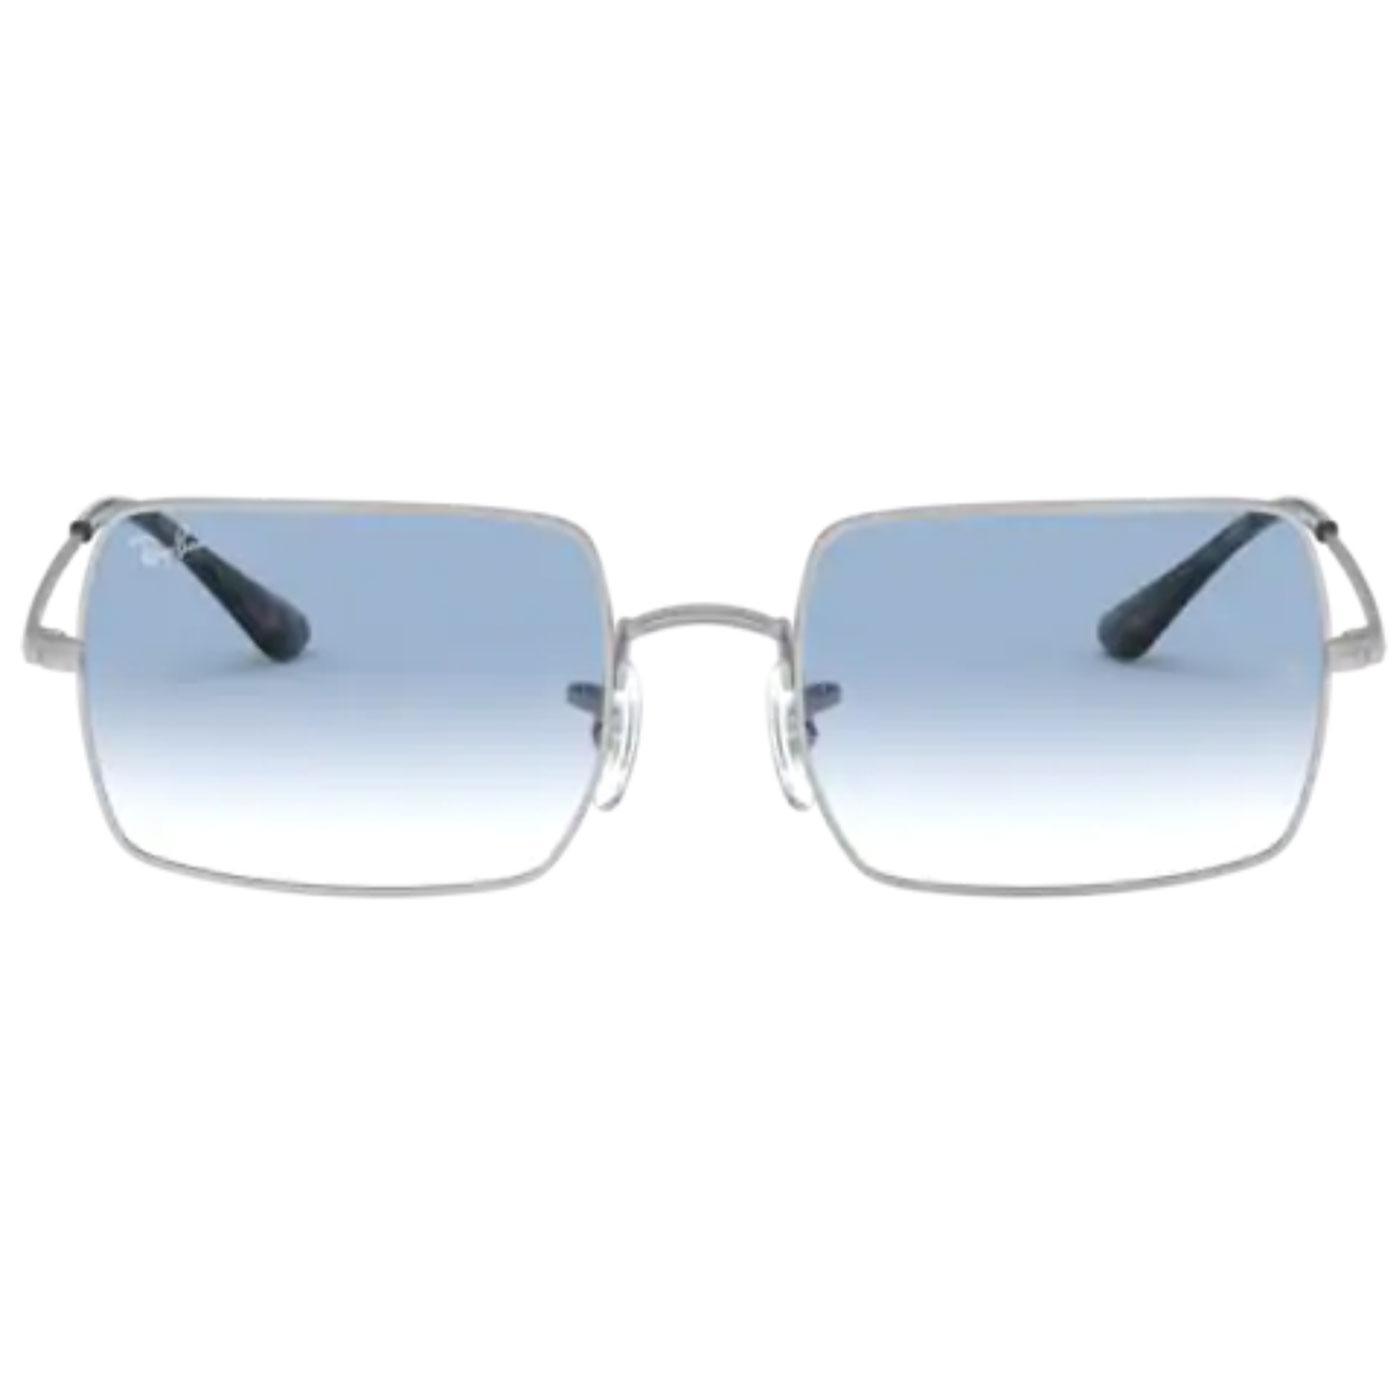 1969 RAY-BAN Retro 60s Rectangle Lens Sunglasses B